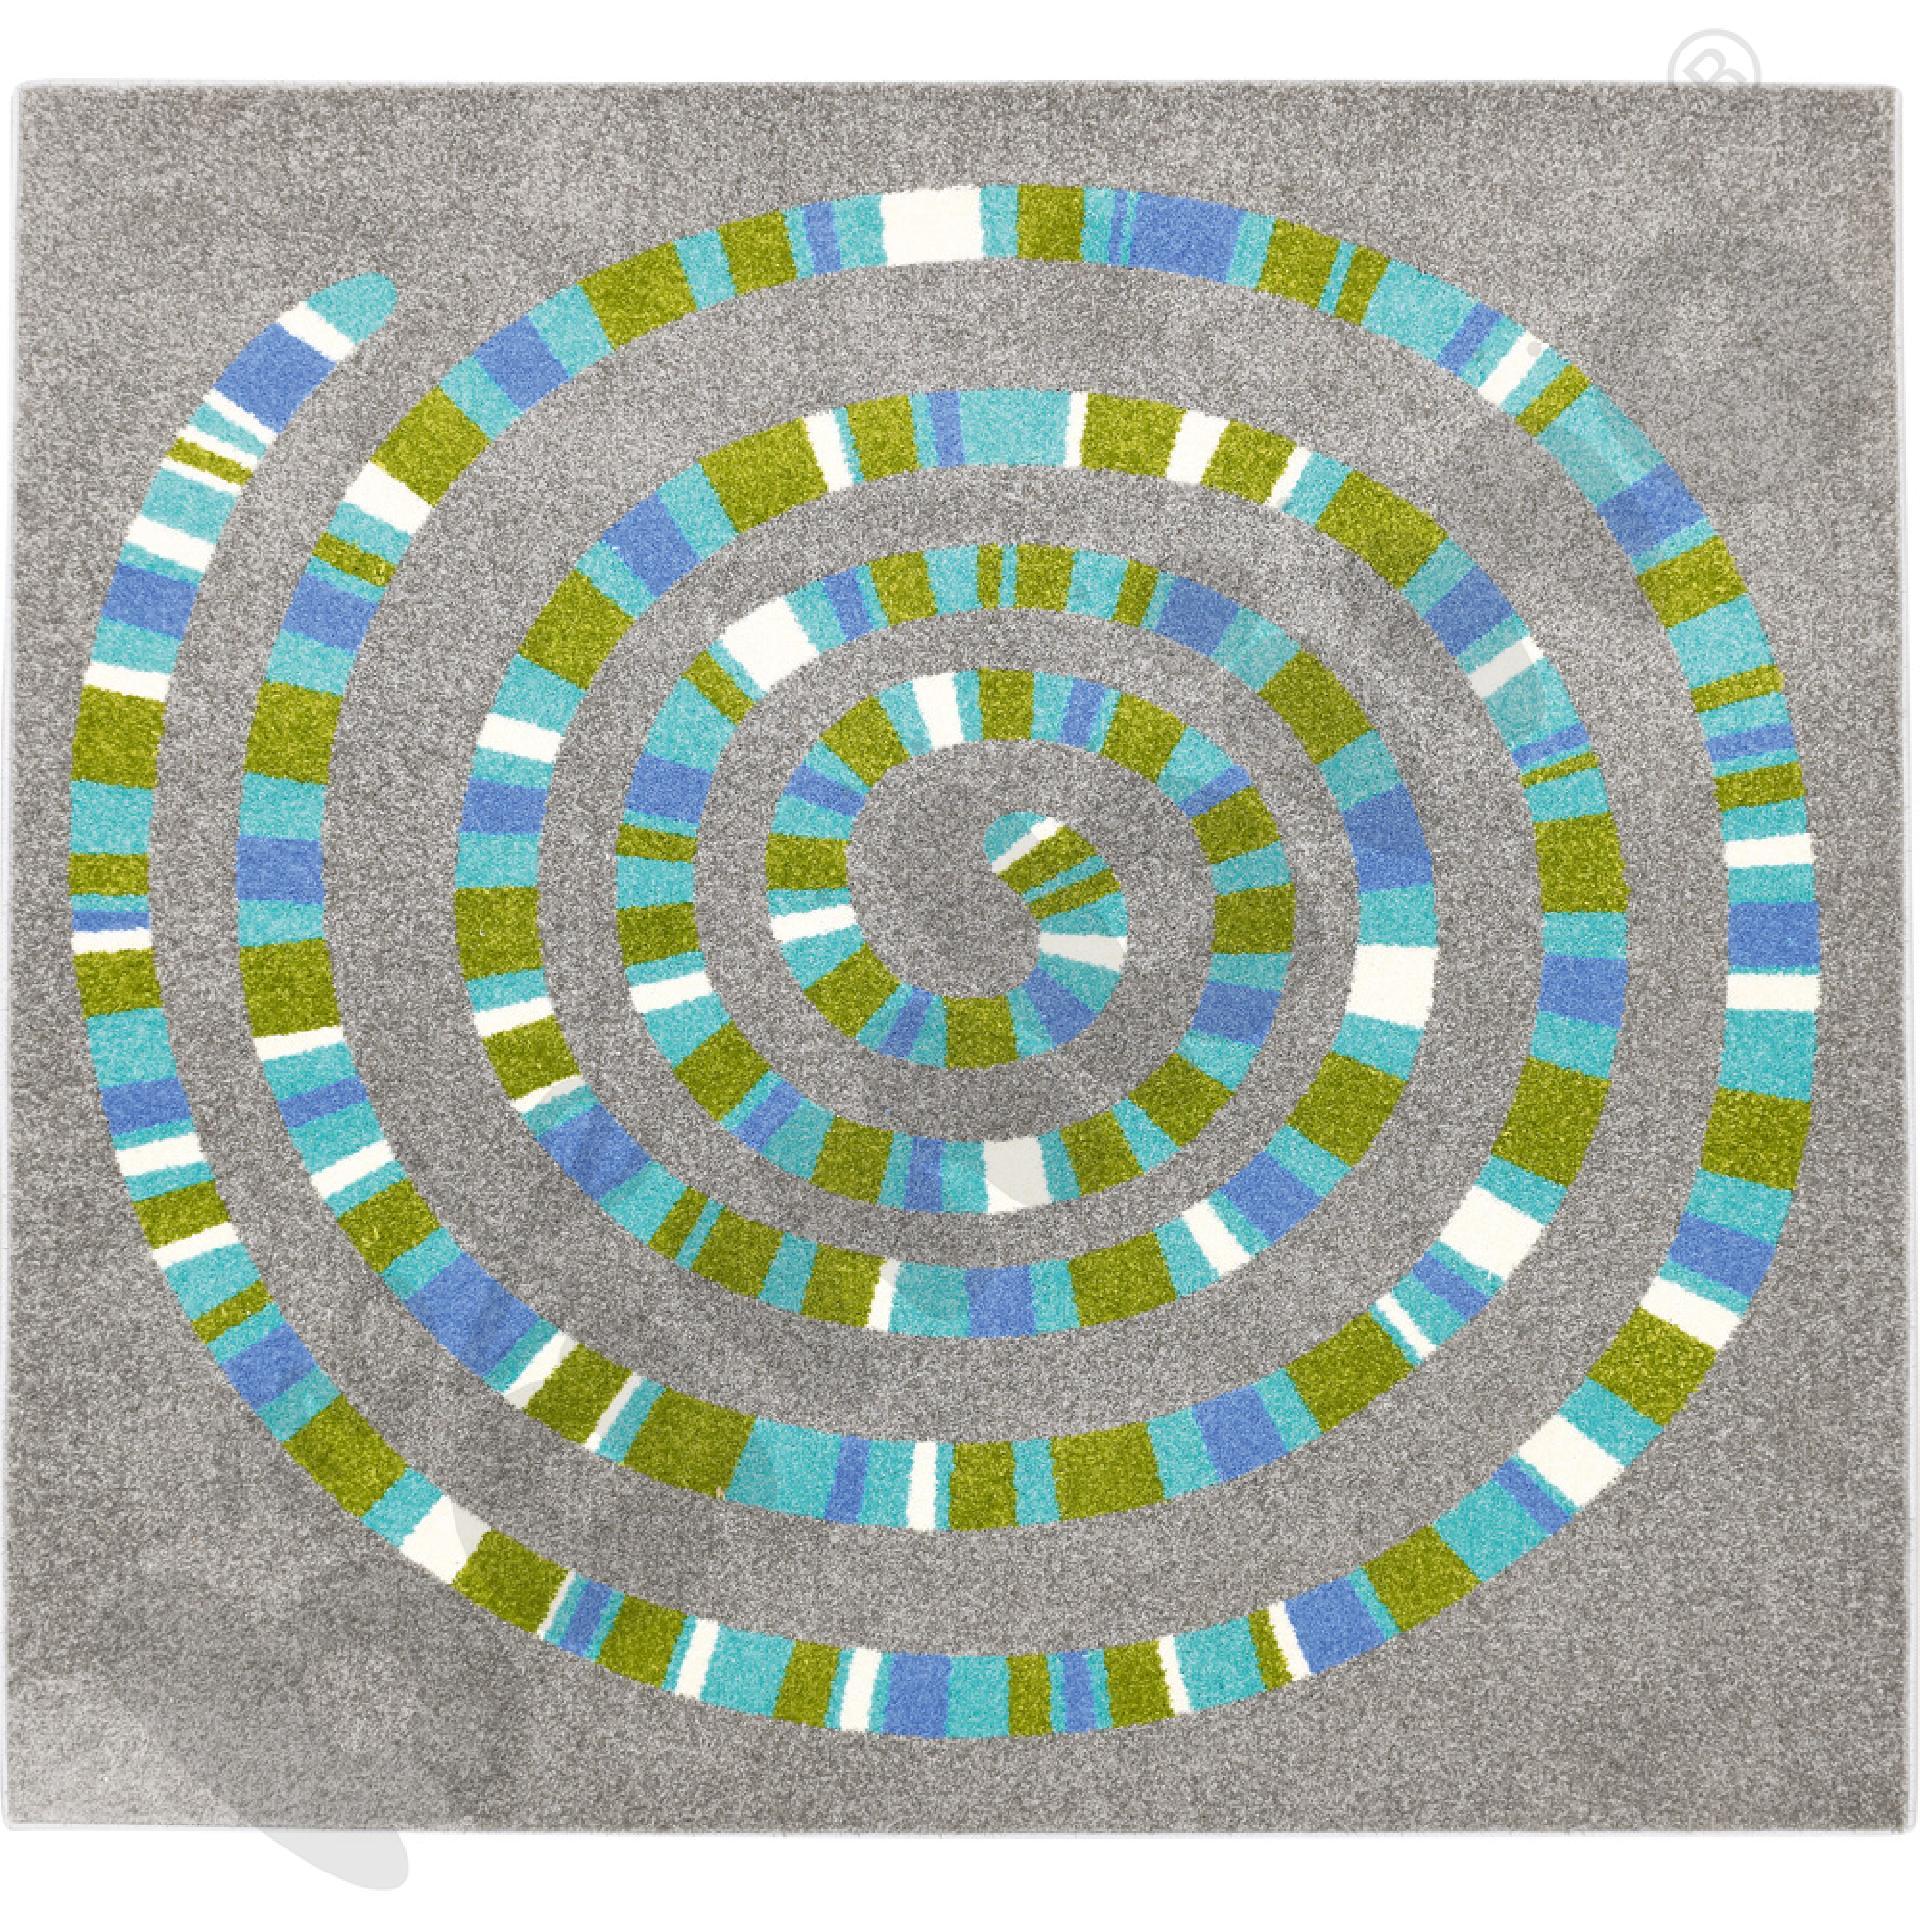 Dywan spirala 2 x 2 m